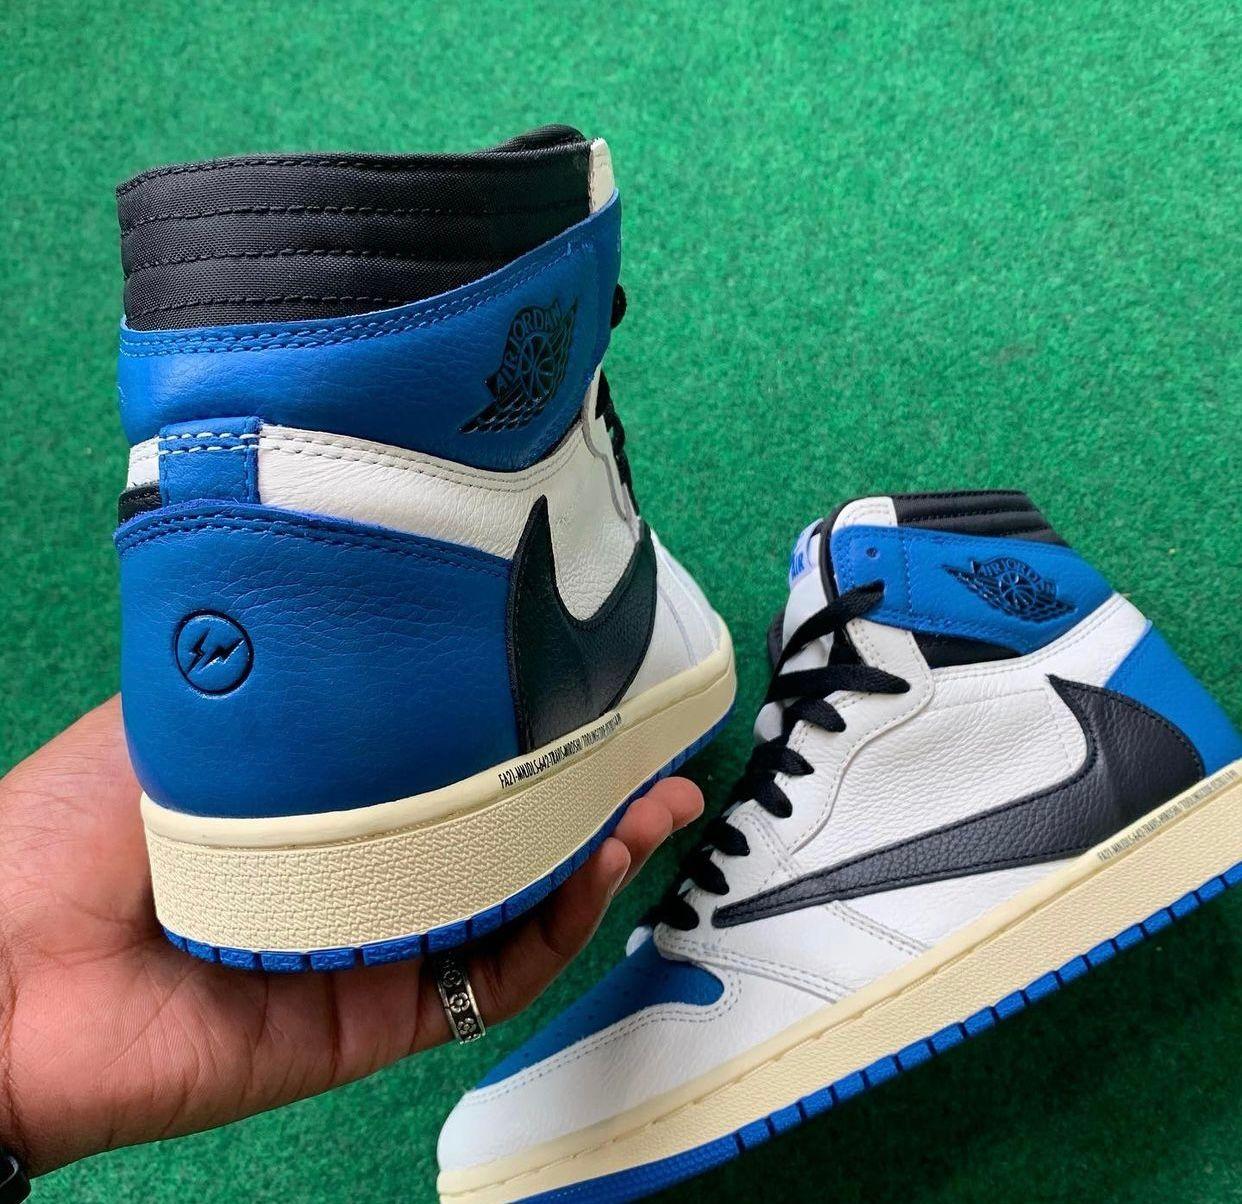 Travis-Scott-x-Fragment-x-Air-Jordan-1-High-OG-Military-Blue-1.jpg